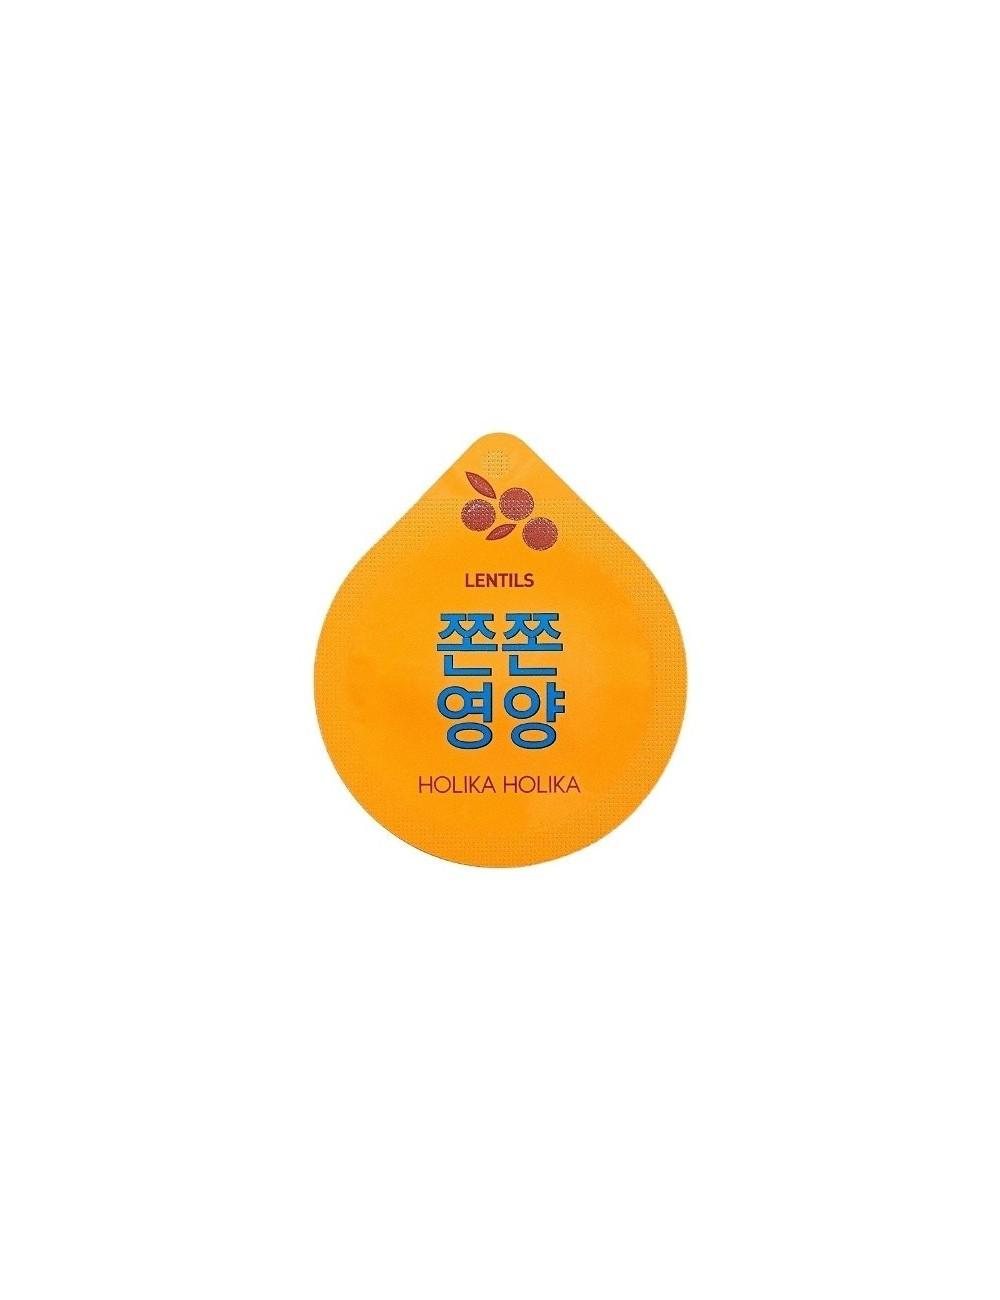 Mascarilla Nocturna Reafirmante Holika Holika Super Food Capsule Pack Lentils (Lentejas)